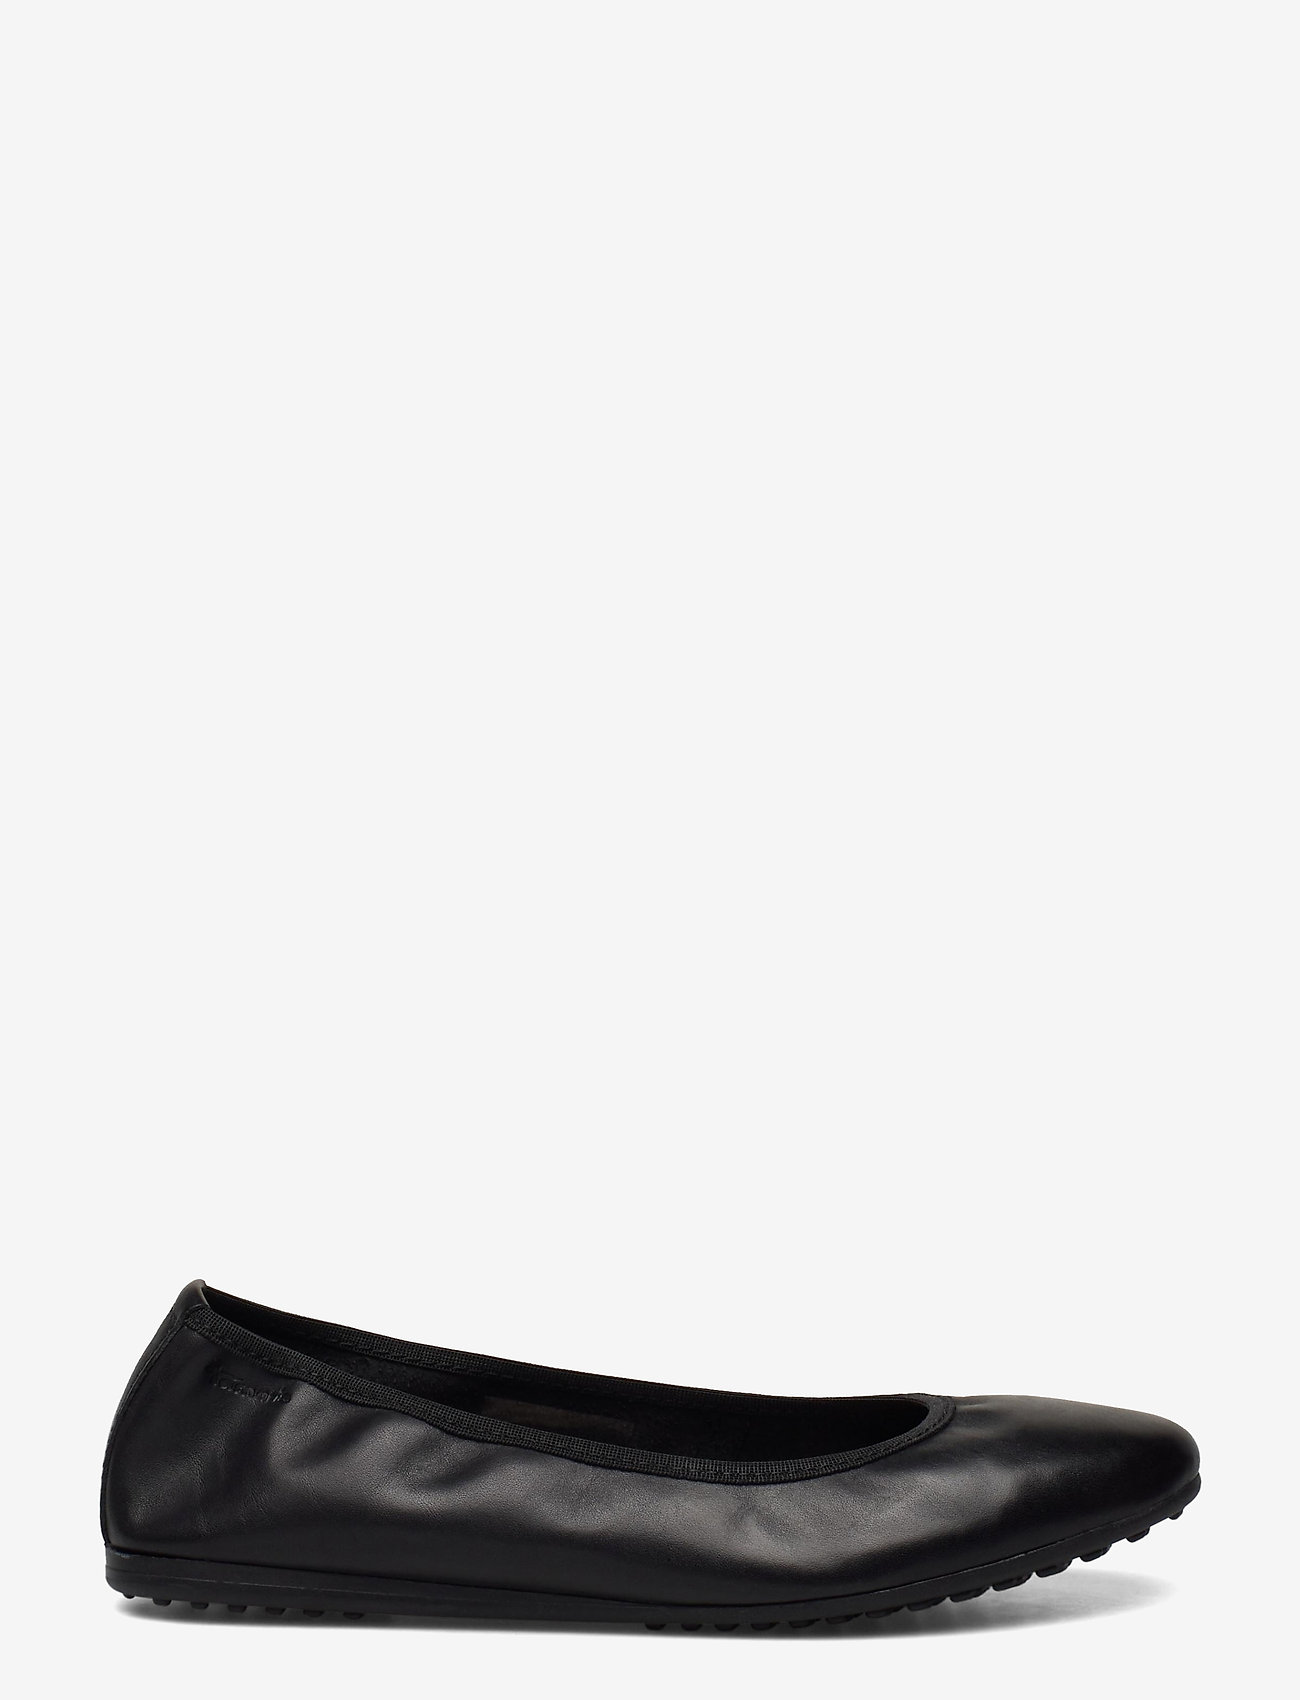 Tamaris - Woms Ballerina - ballerinas - black leather - 1